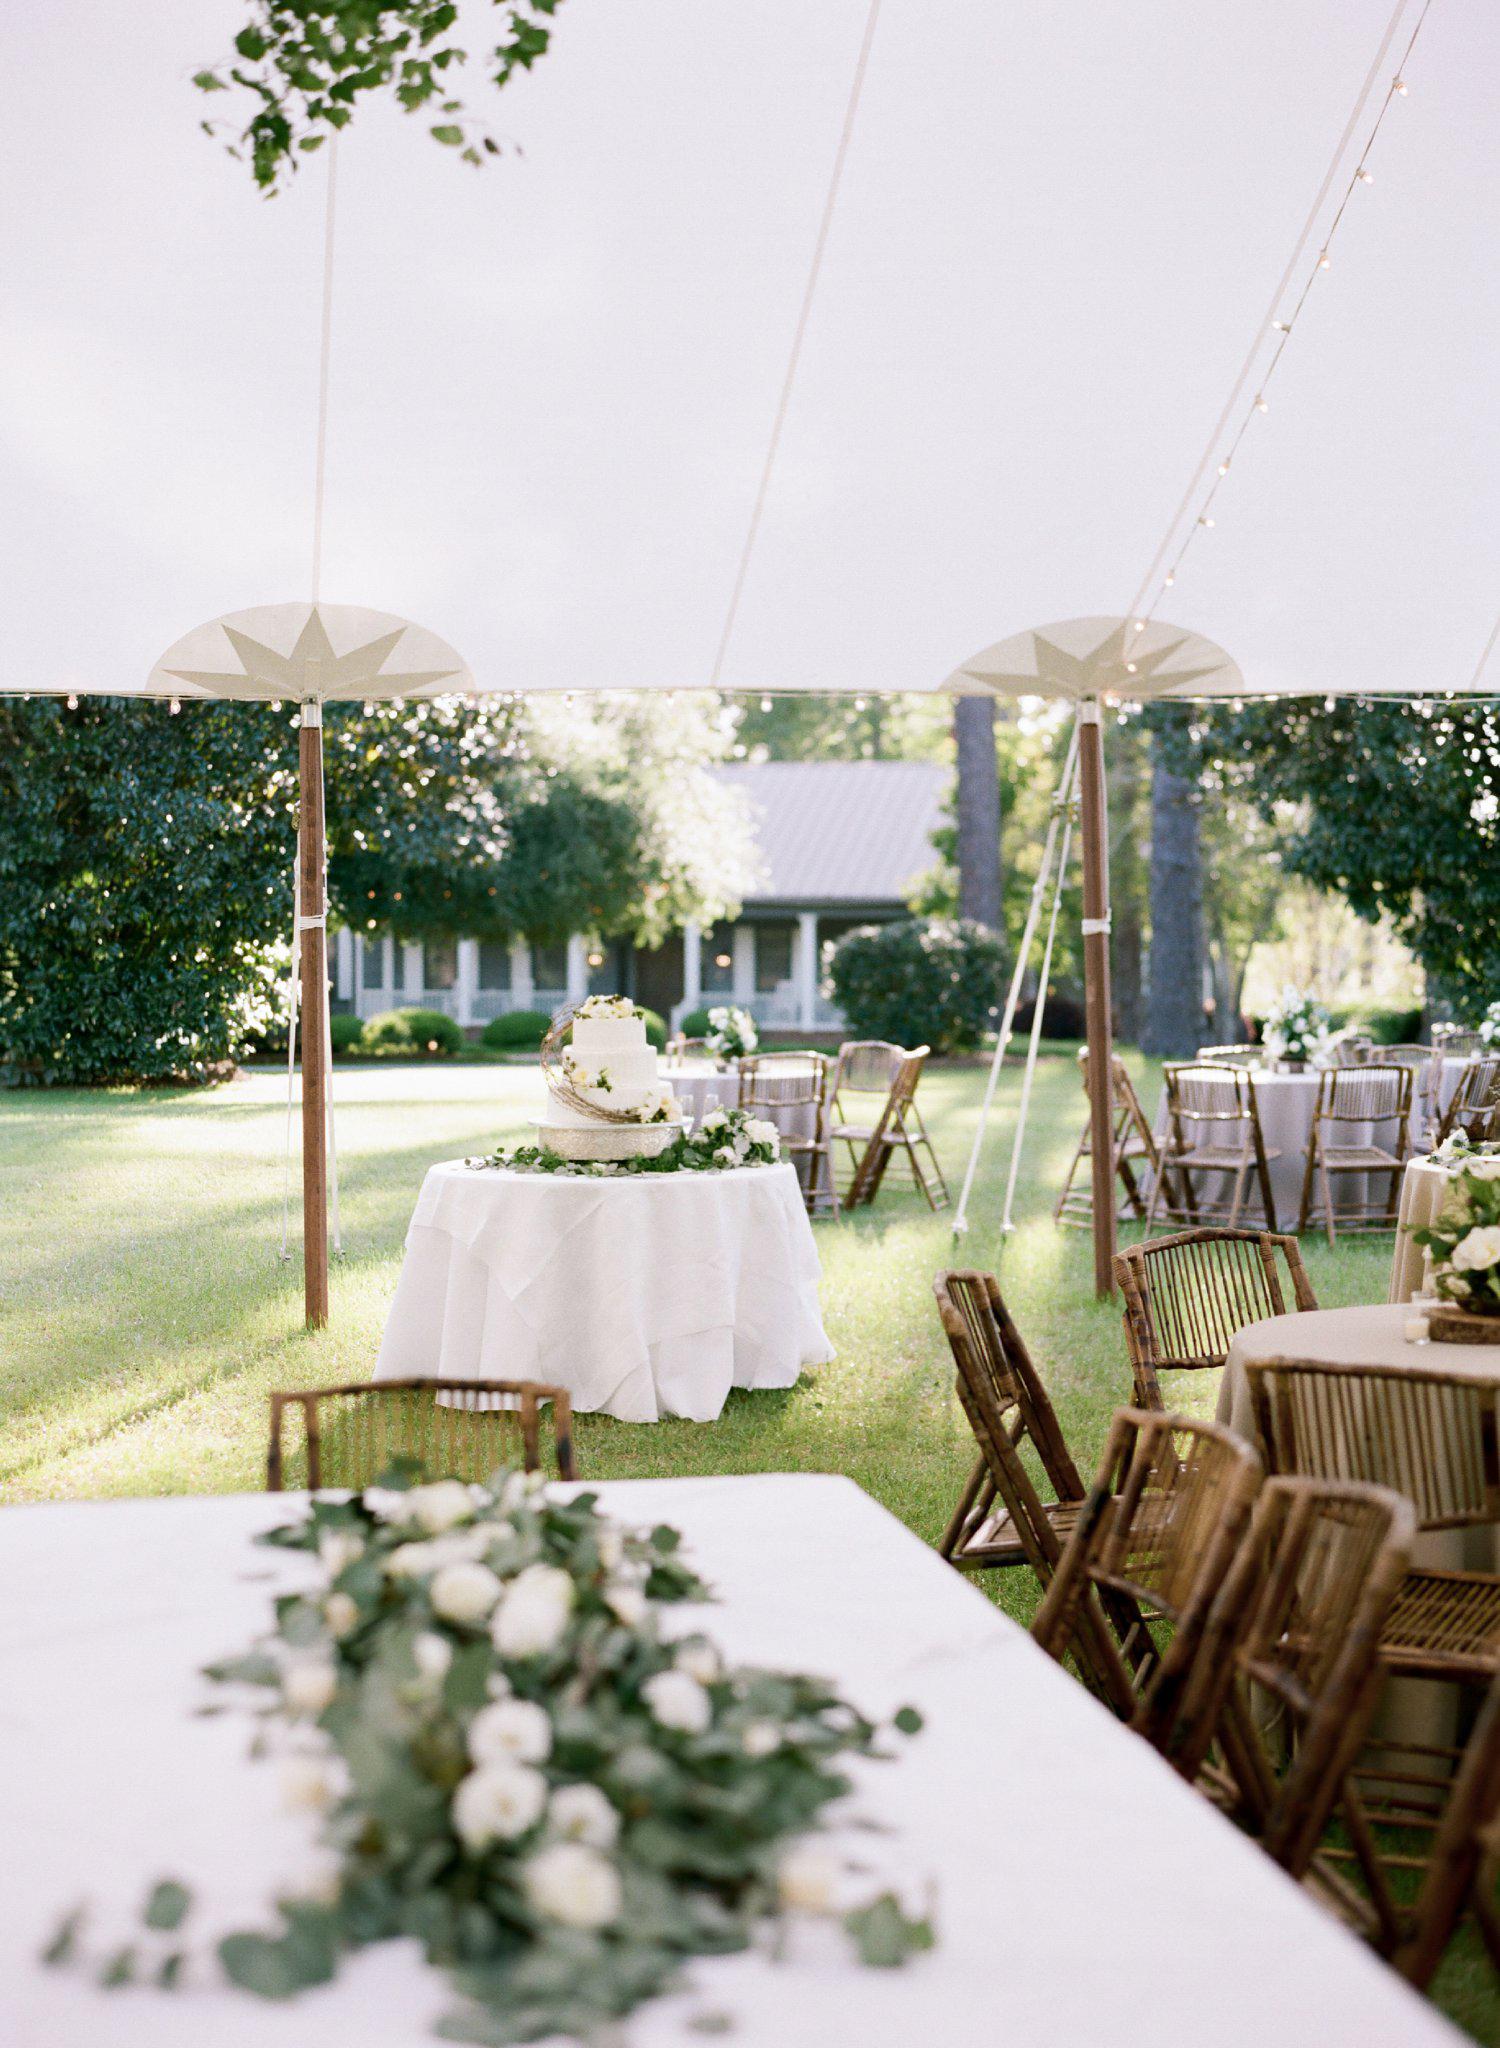 ecila farm wedding albany georgia wedding photographer shannon griffin photography-27.jpg